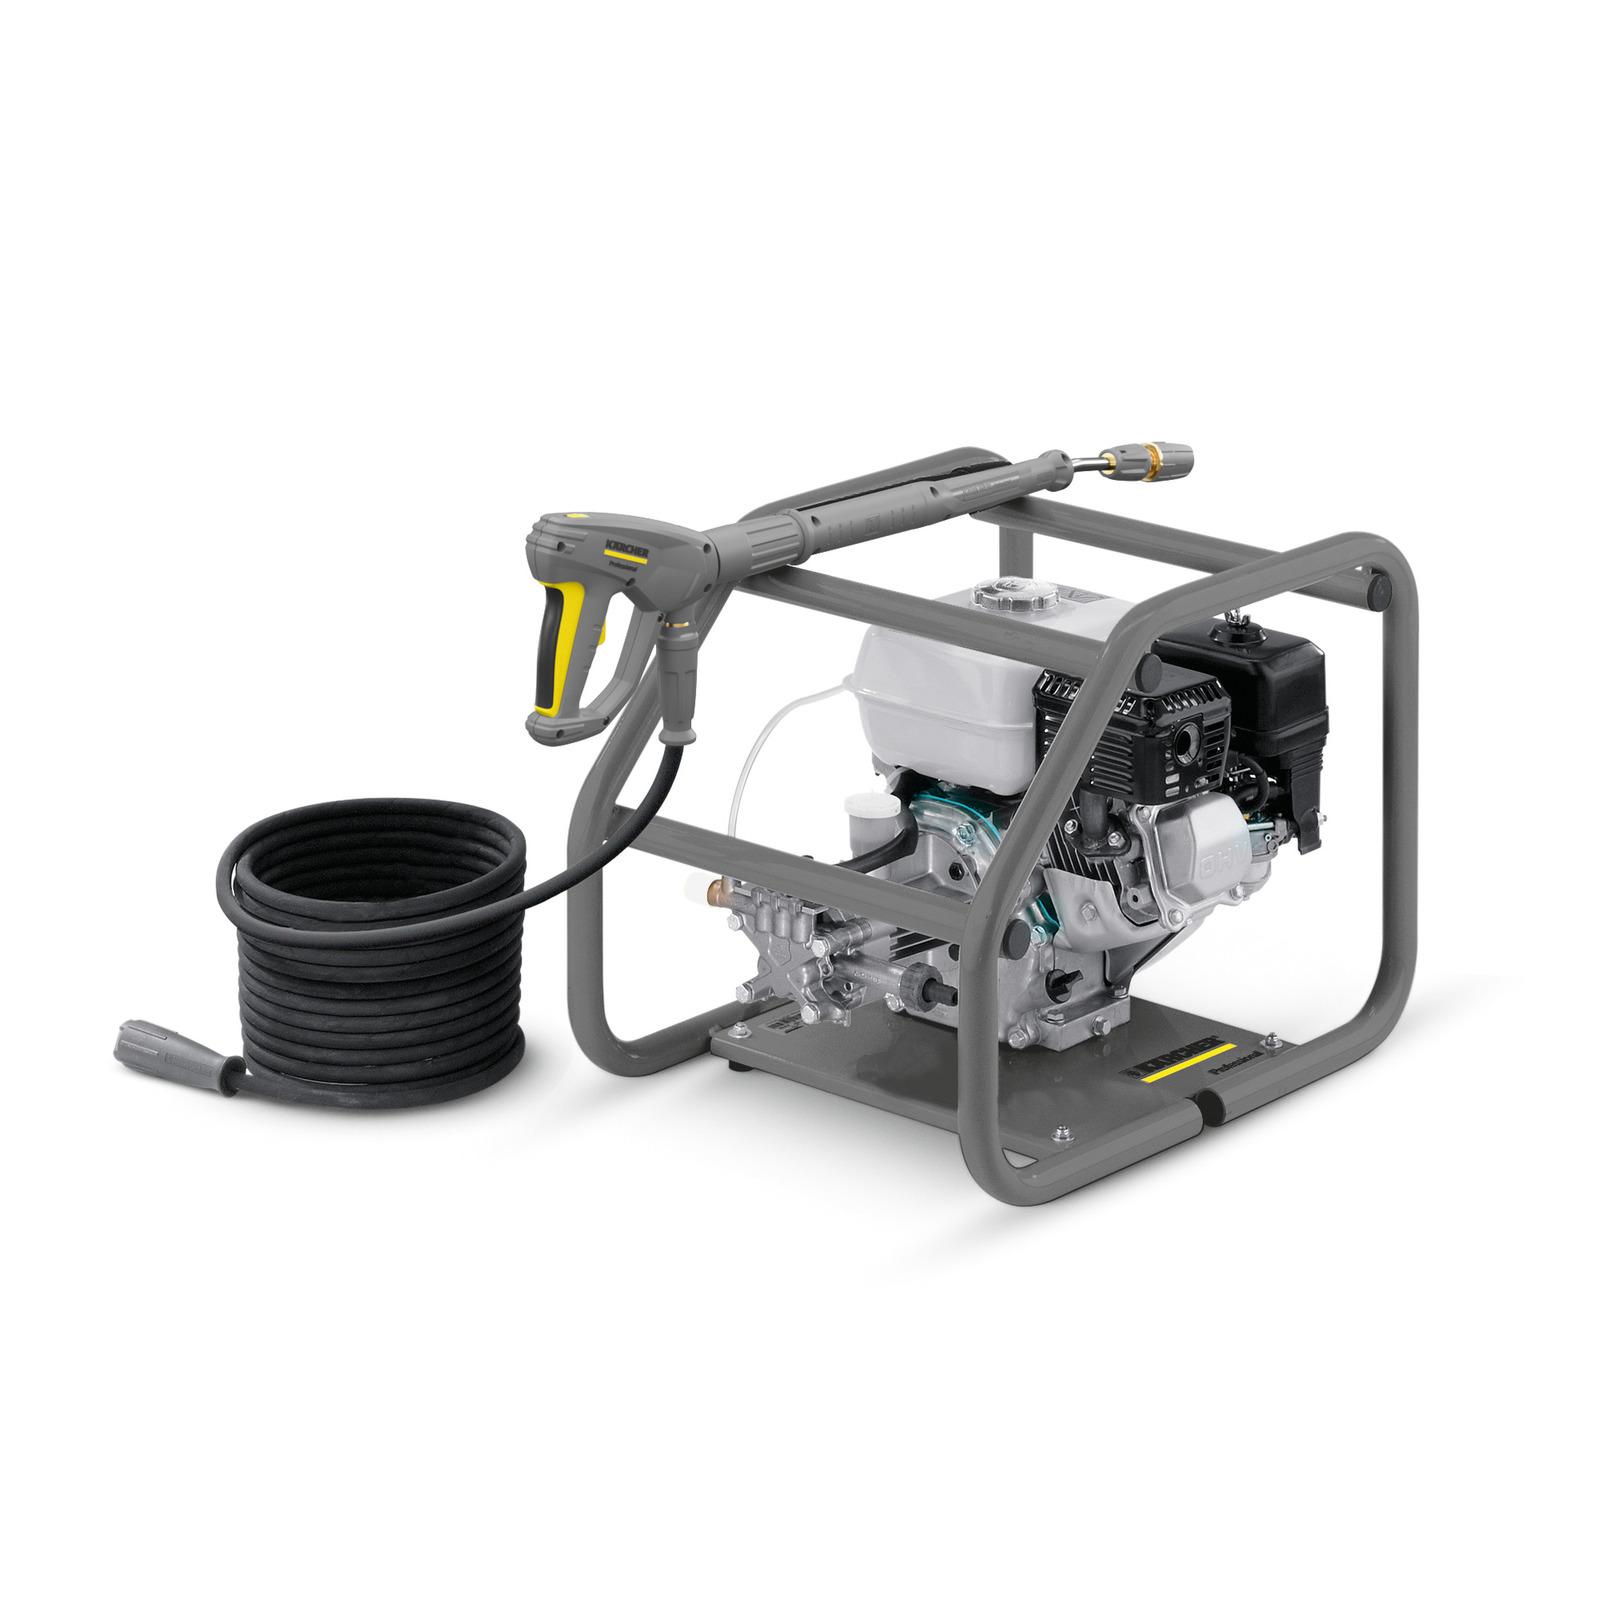 High Pressure Washer Hd 728 B Cage K Rcher Uk